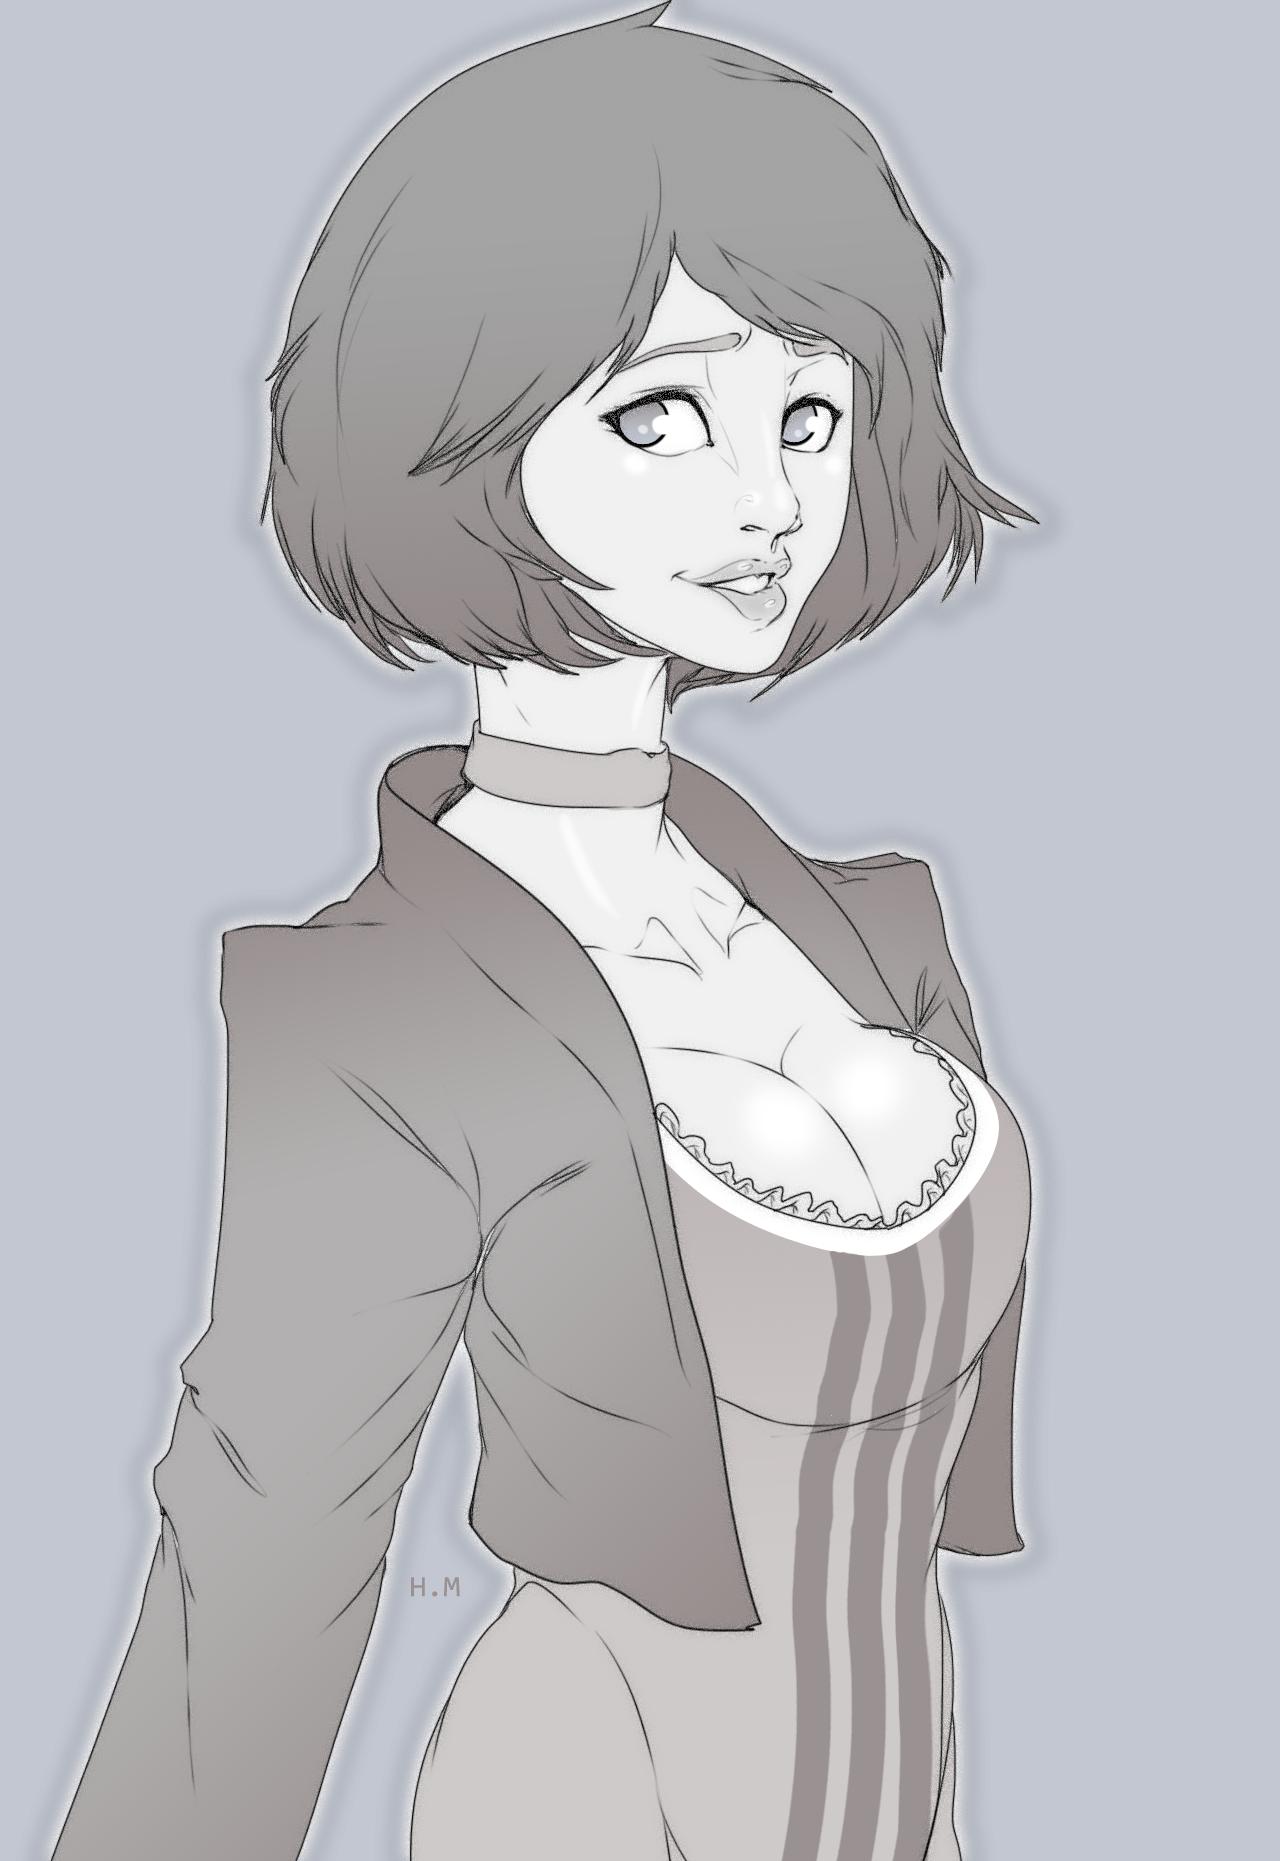 Elizabeth linework